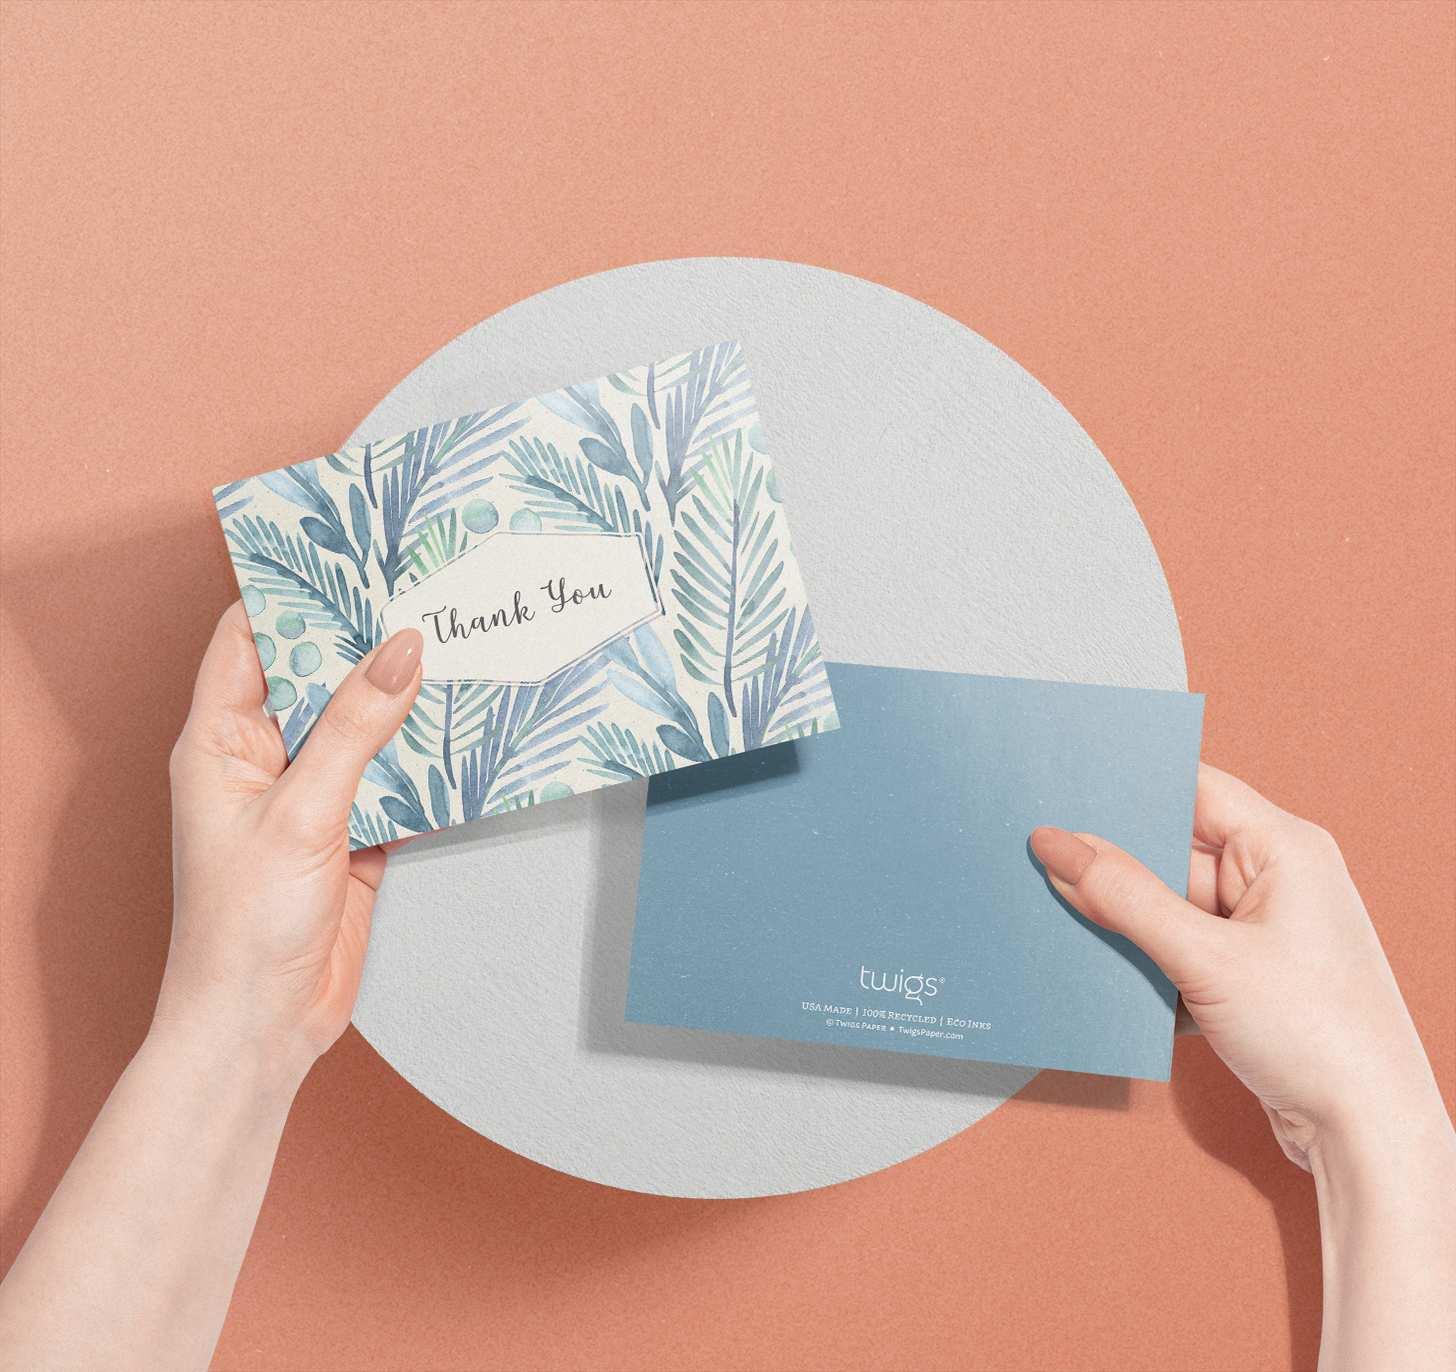 Hands holding Blue floral design thank you card